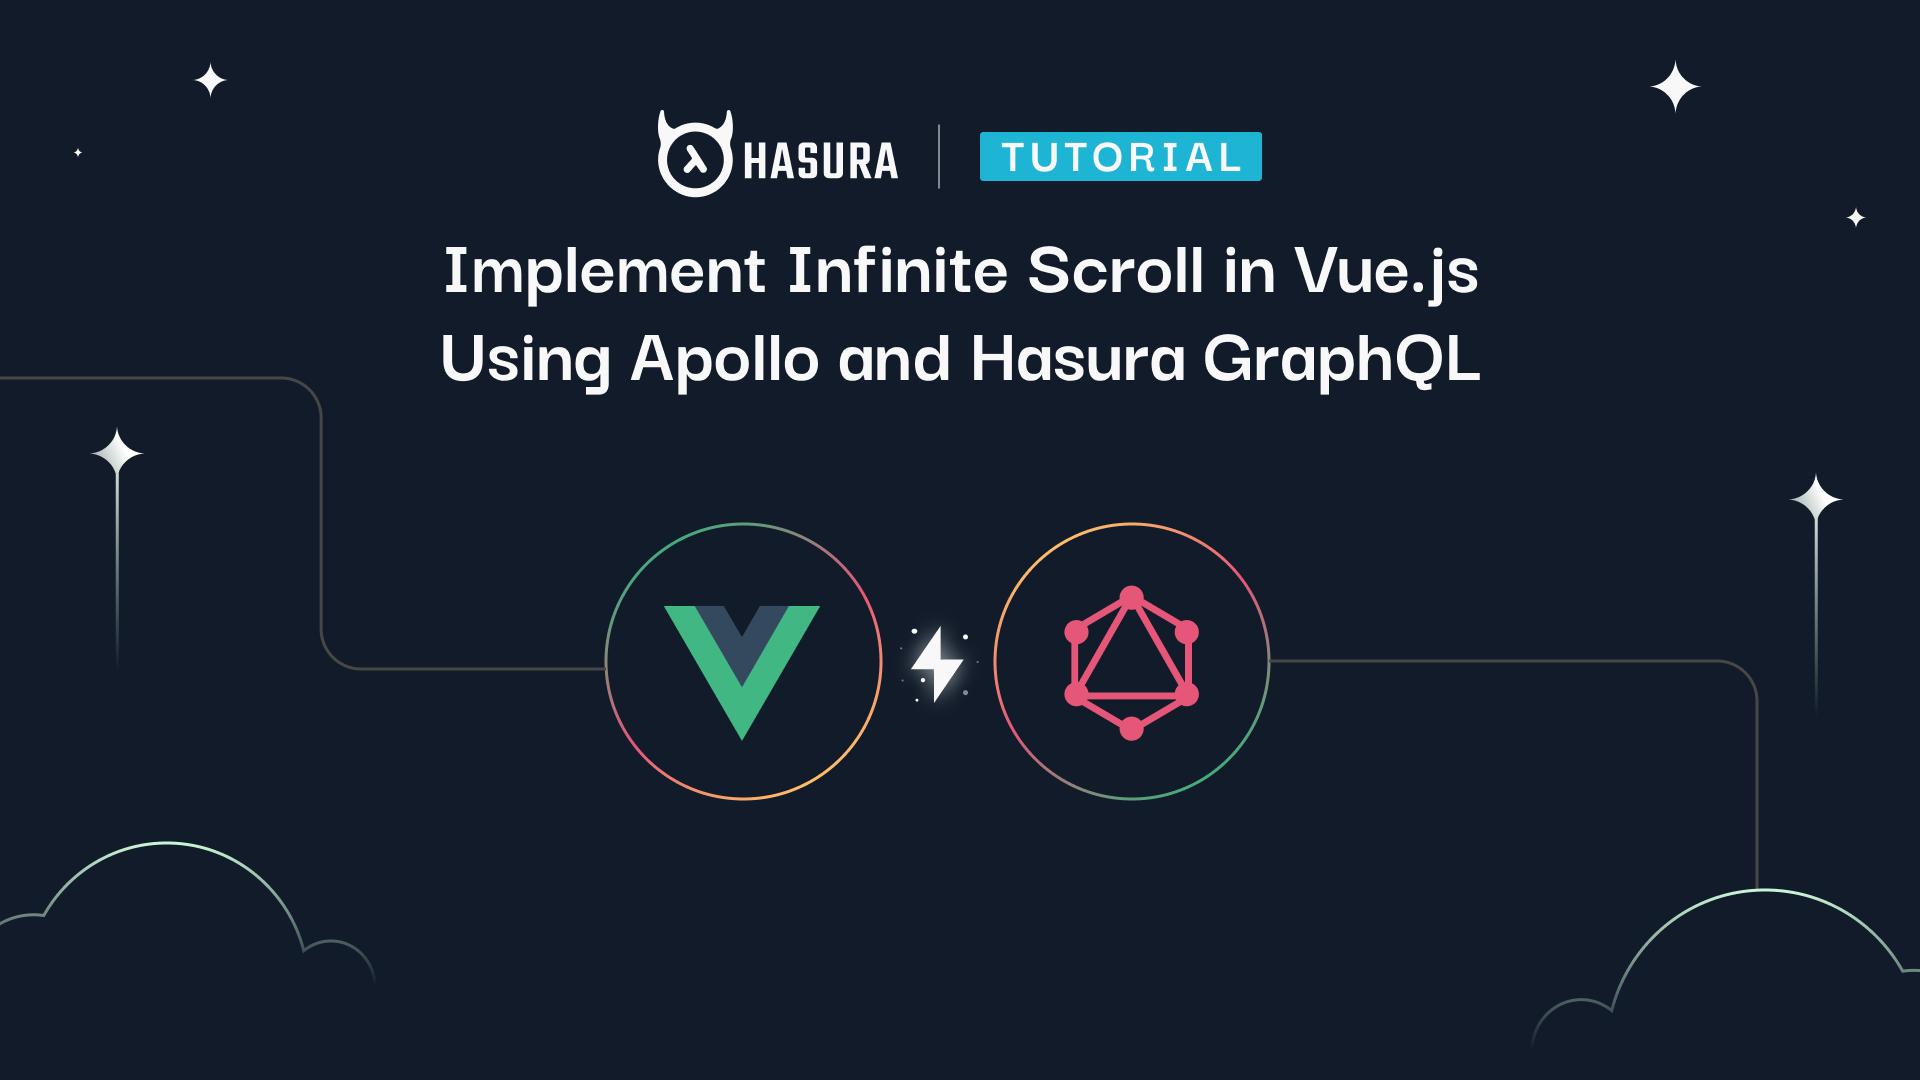 Implement Infinite Scroll in Vue.js Using Hasura GraphQL